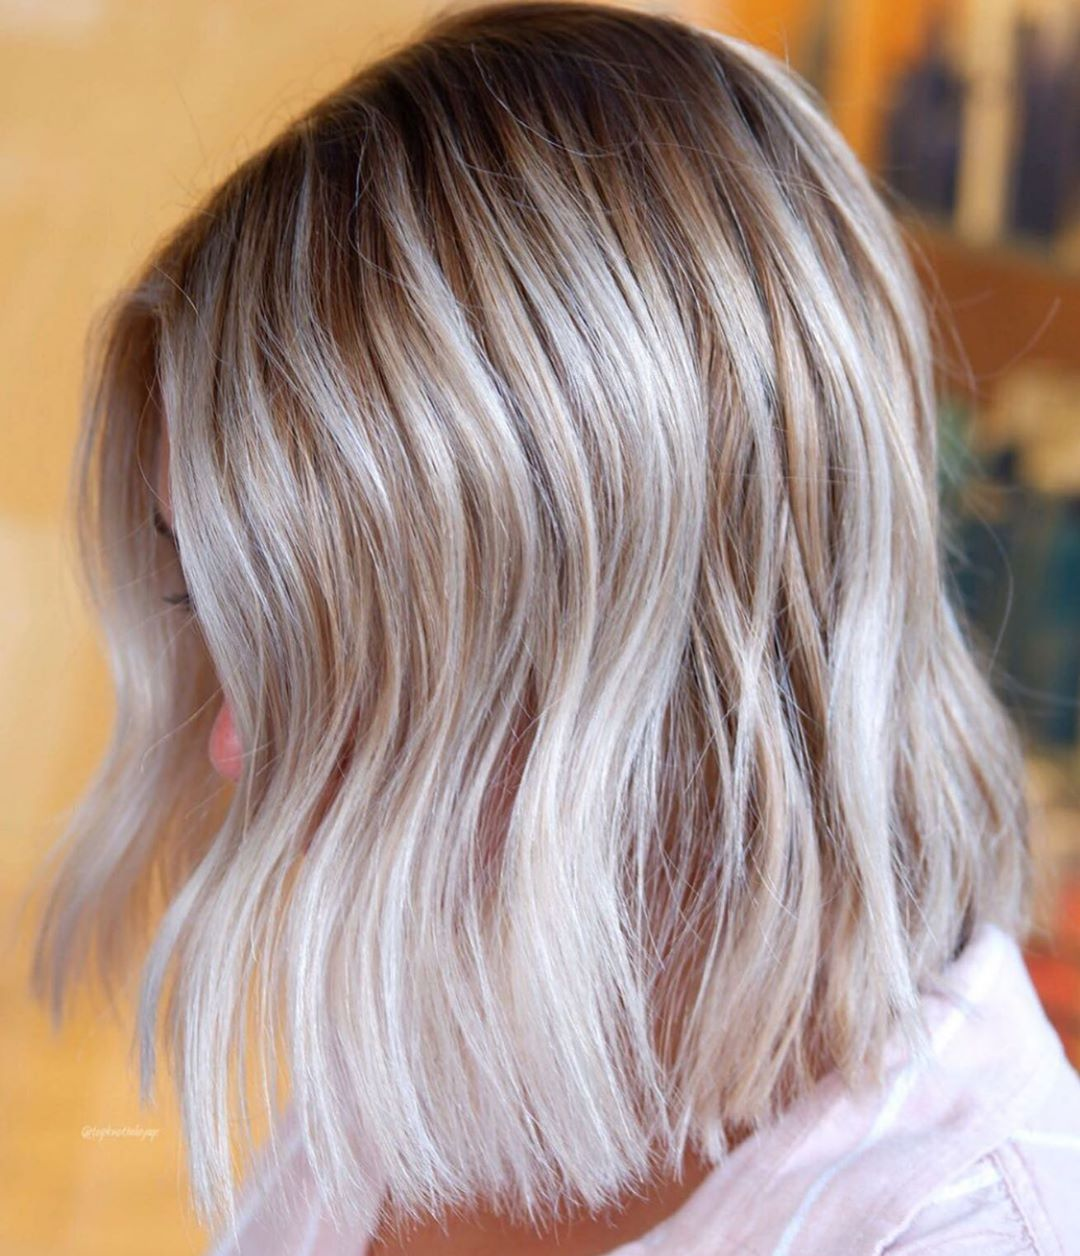 10 Ombre Hairstyles For Medium Length Hair Women Medium Haircut 2020 2021